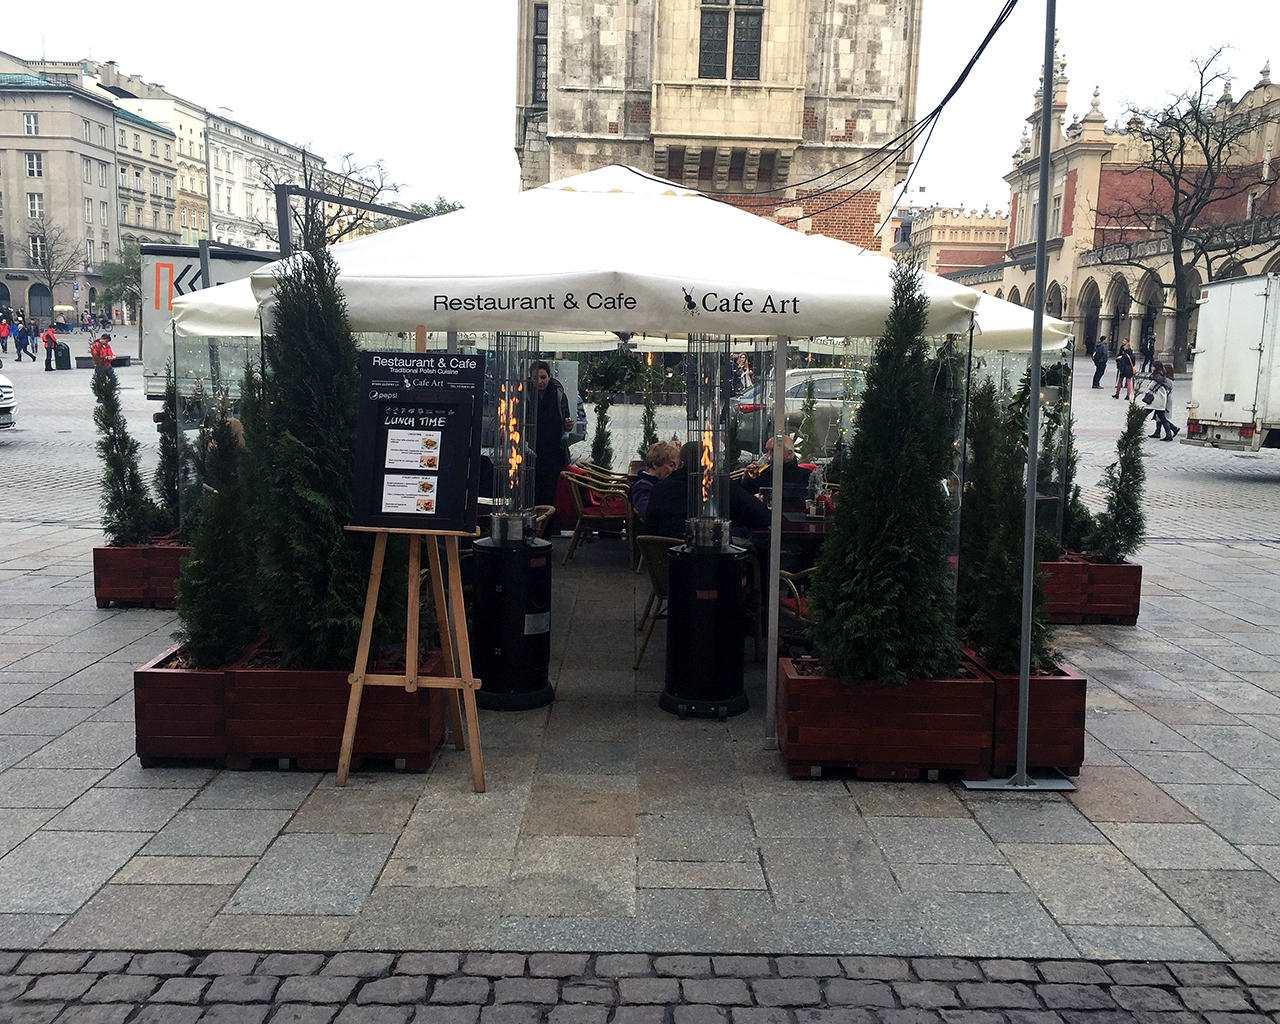 ogródek zimowy Restaurant & Cafe CAFE ART